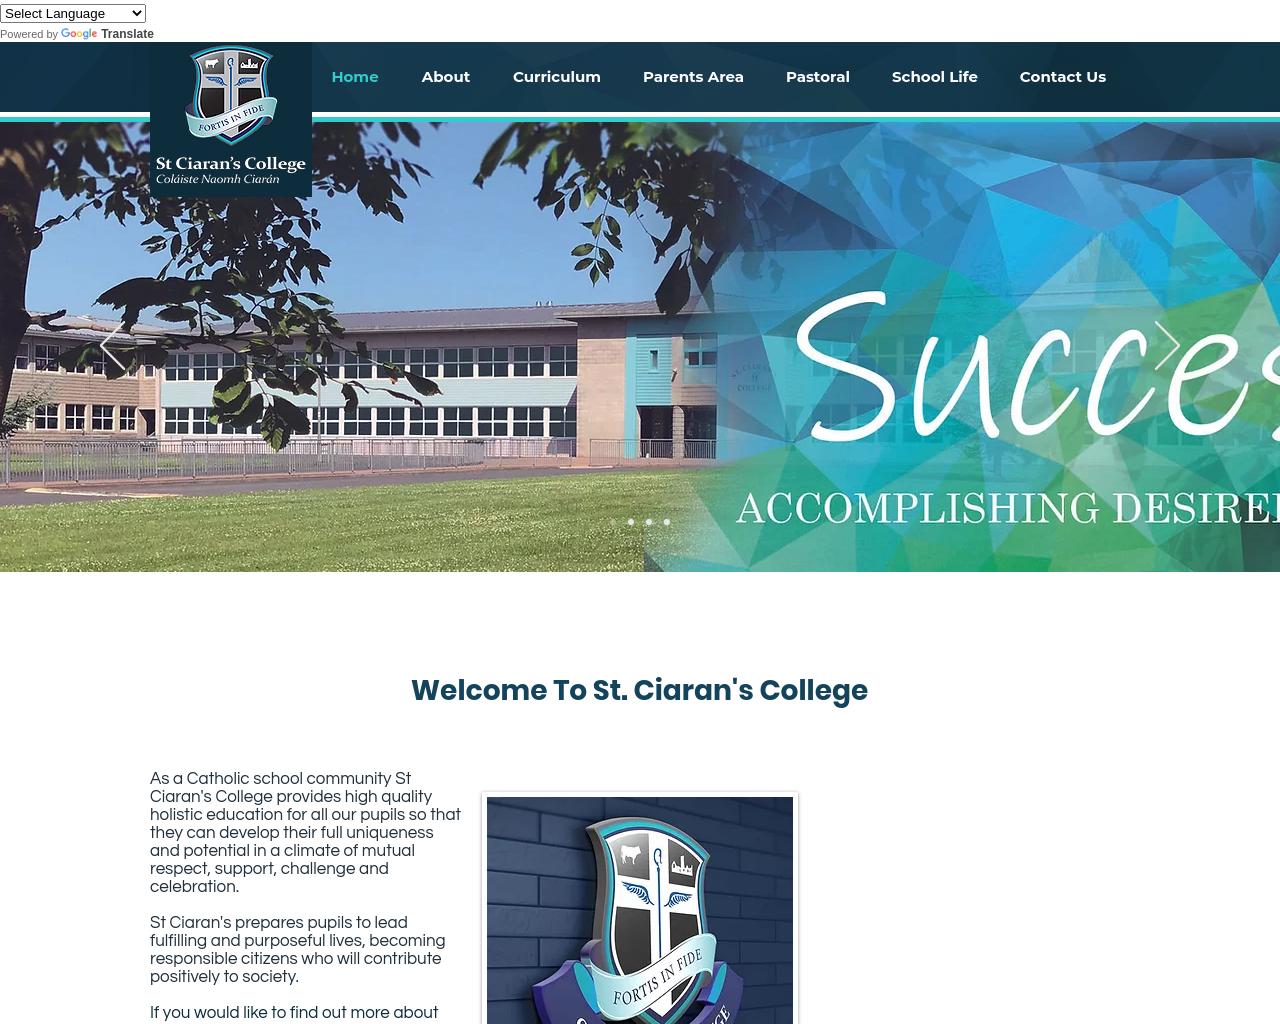 St Ciaran's College Ballygawley